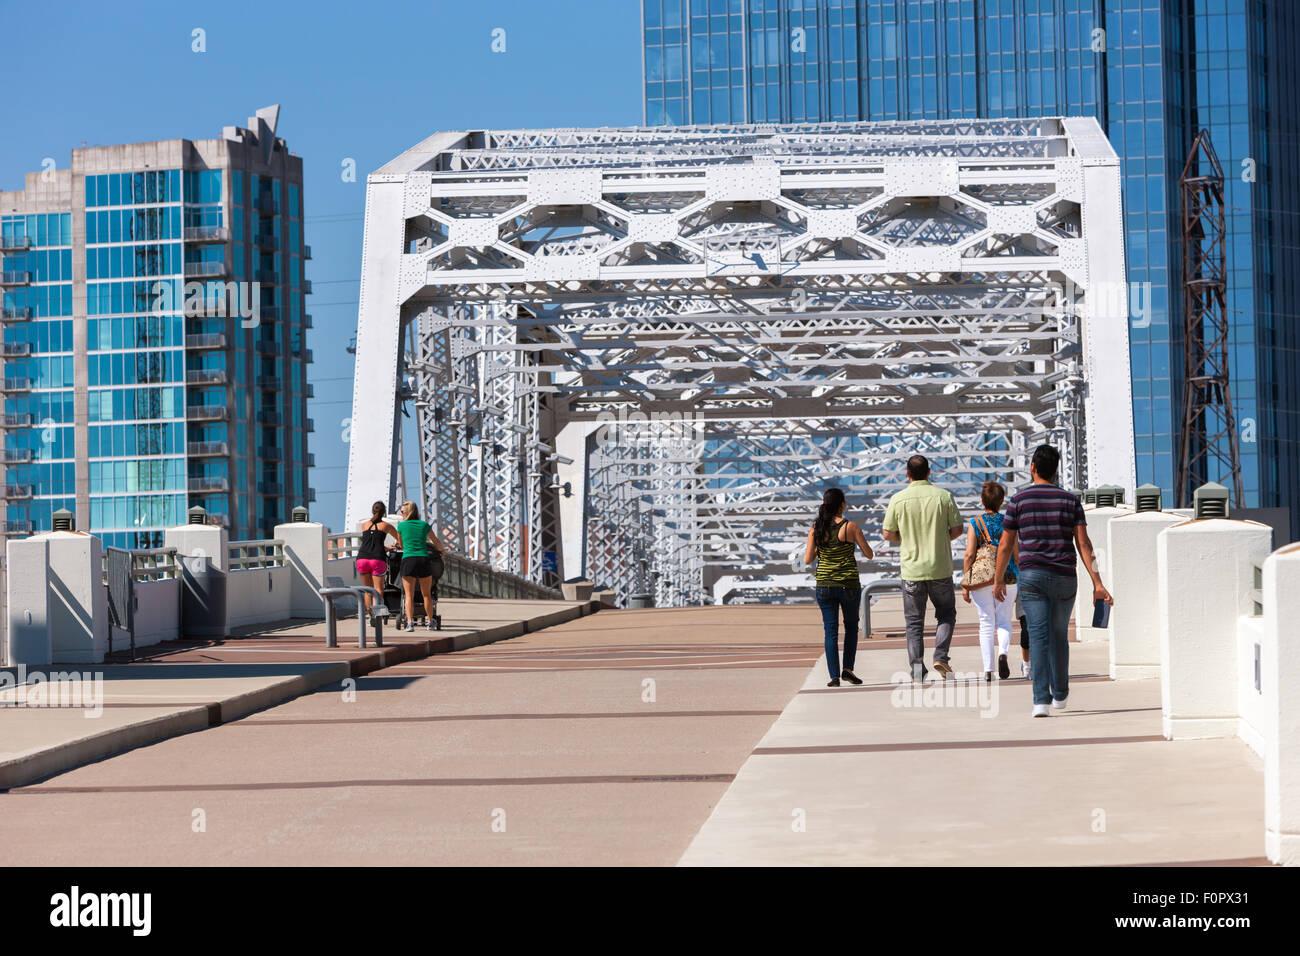 People walk across the John Seigenthaler pedestrian bridge into downtown Nashville, Tennessee. - Stock Image